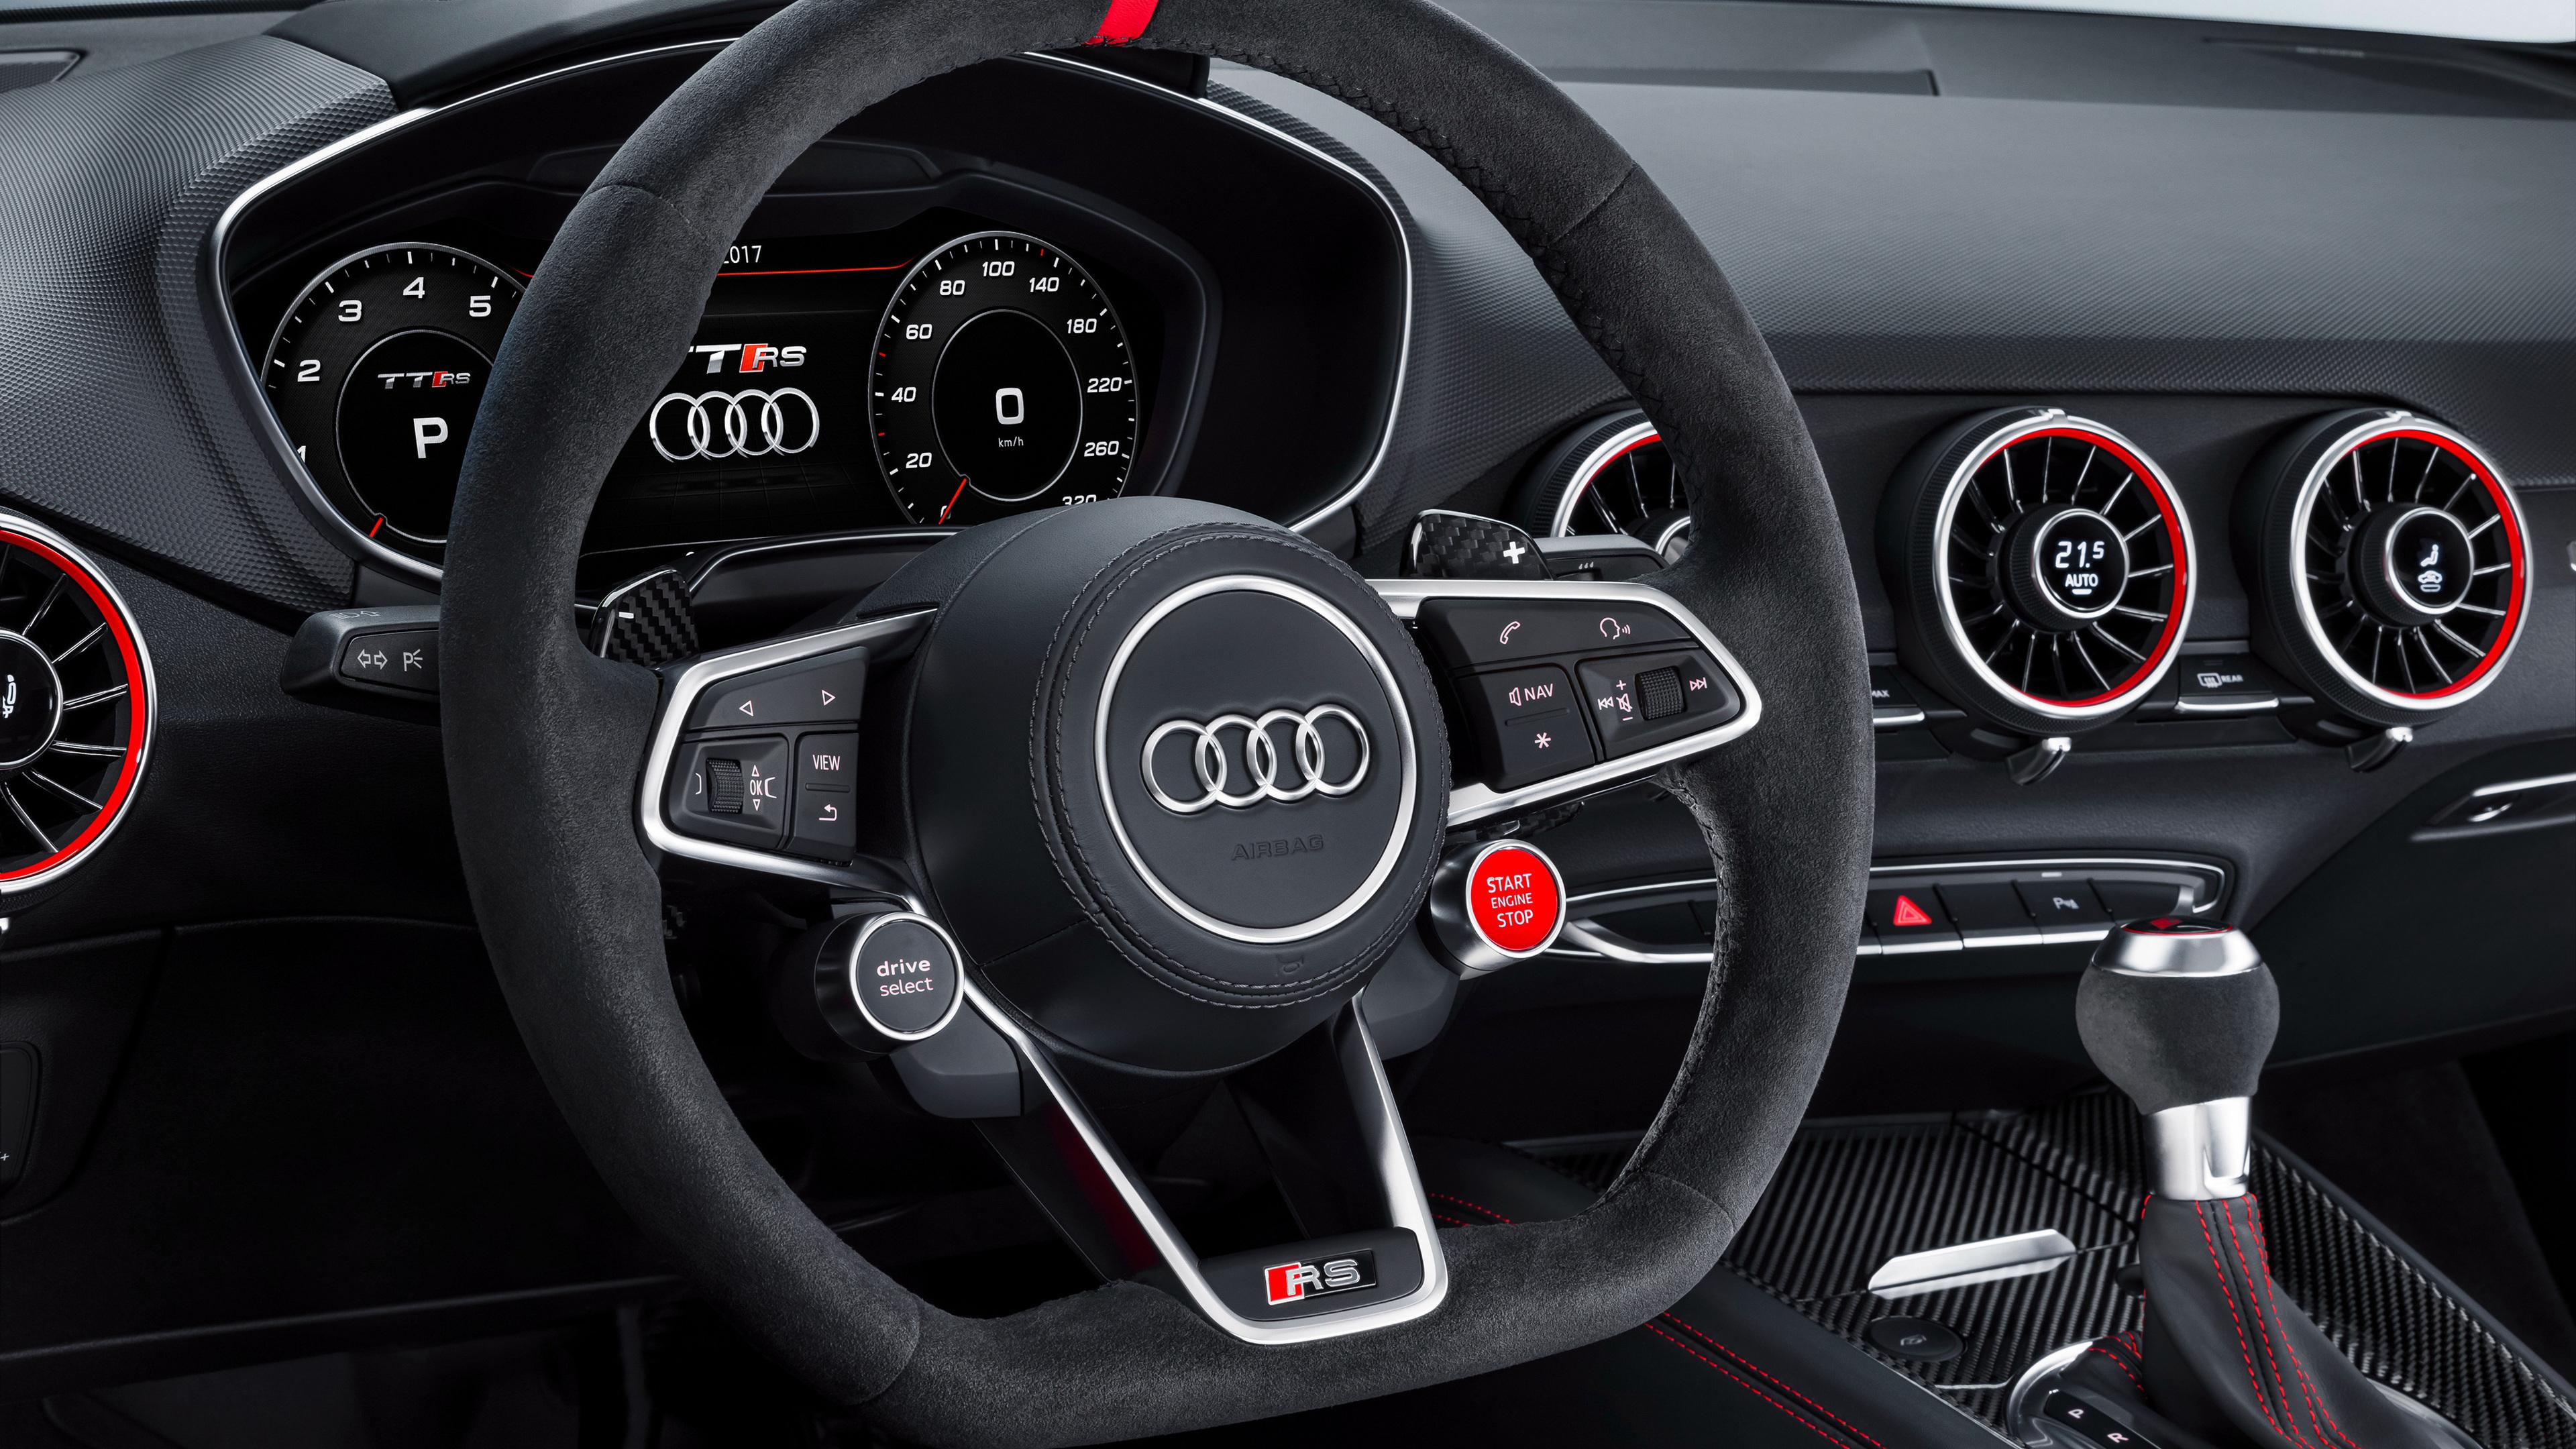 audi tt rs 2017 interior 1539105886 - Audi TT RS 2017 Interior - hd-wallpapers, cars wallpapers, audi wallpapers, audi tt wallpapers, 4k-wallpapers, 2017 cars wallpapers